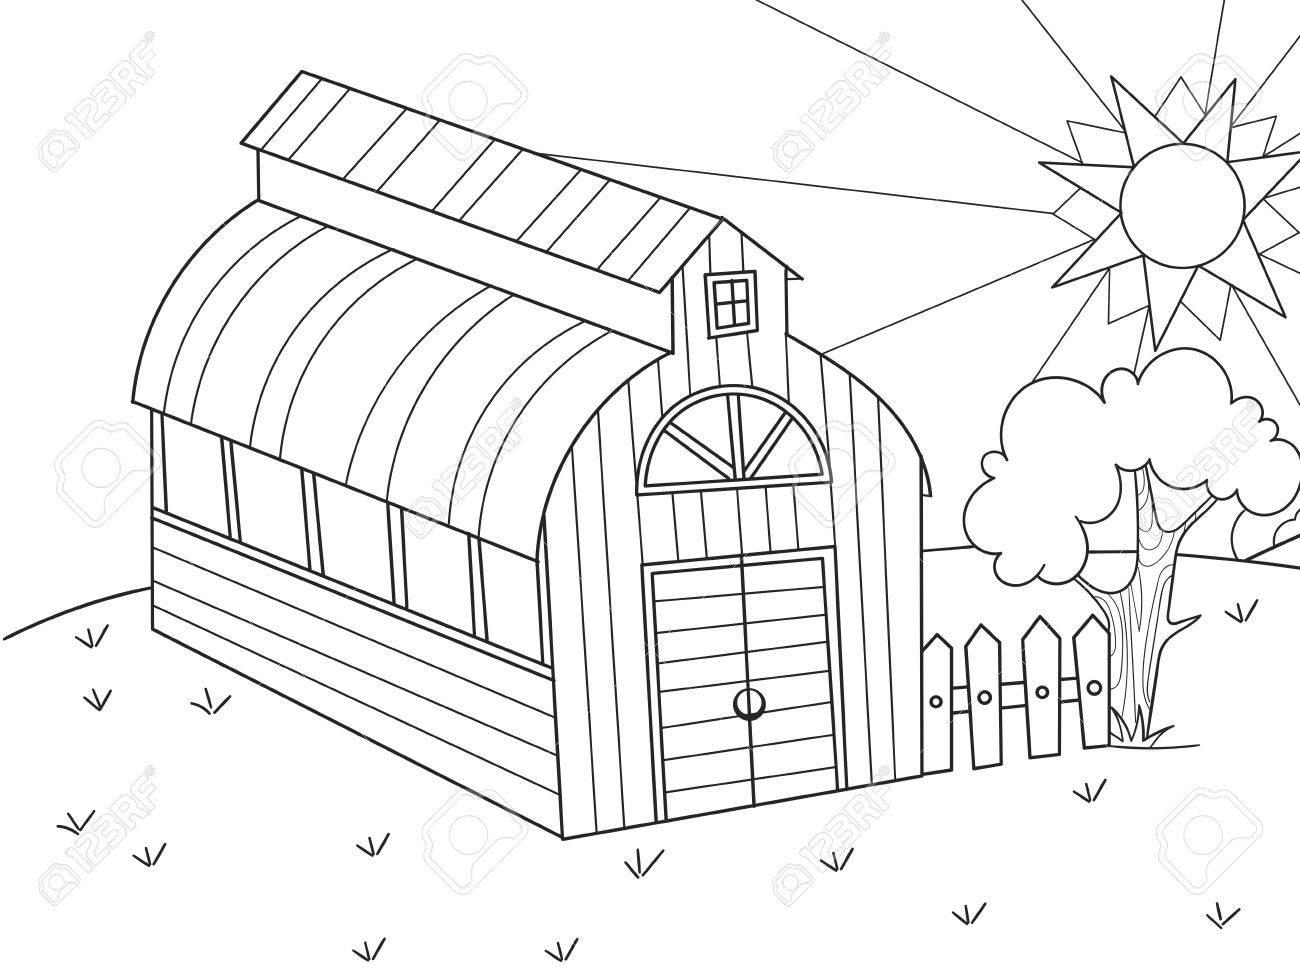 Hangar For Food Animals Barn Vector Of A